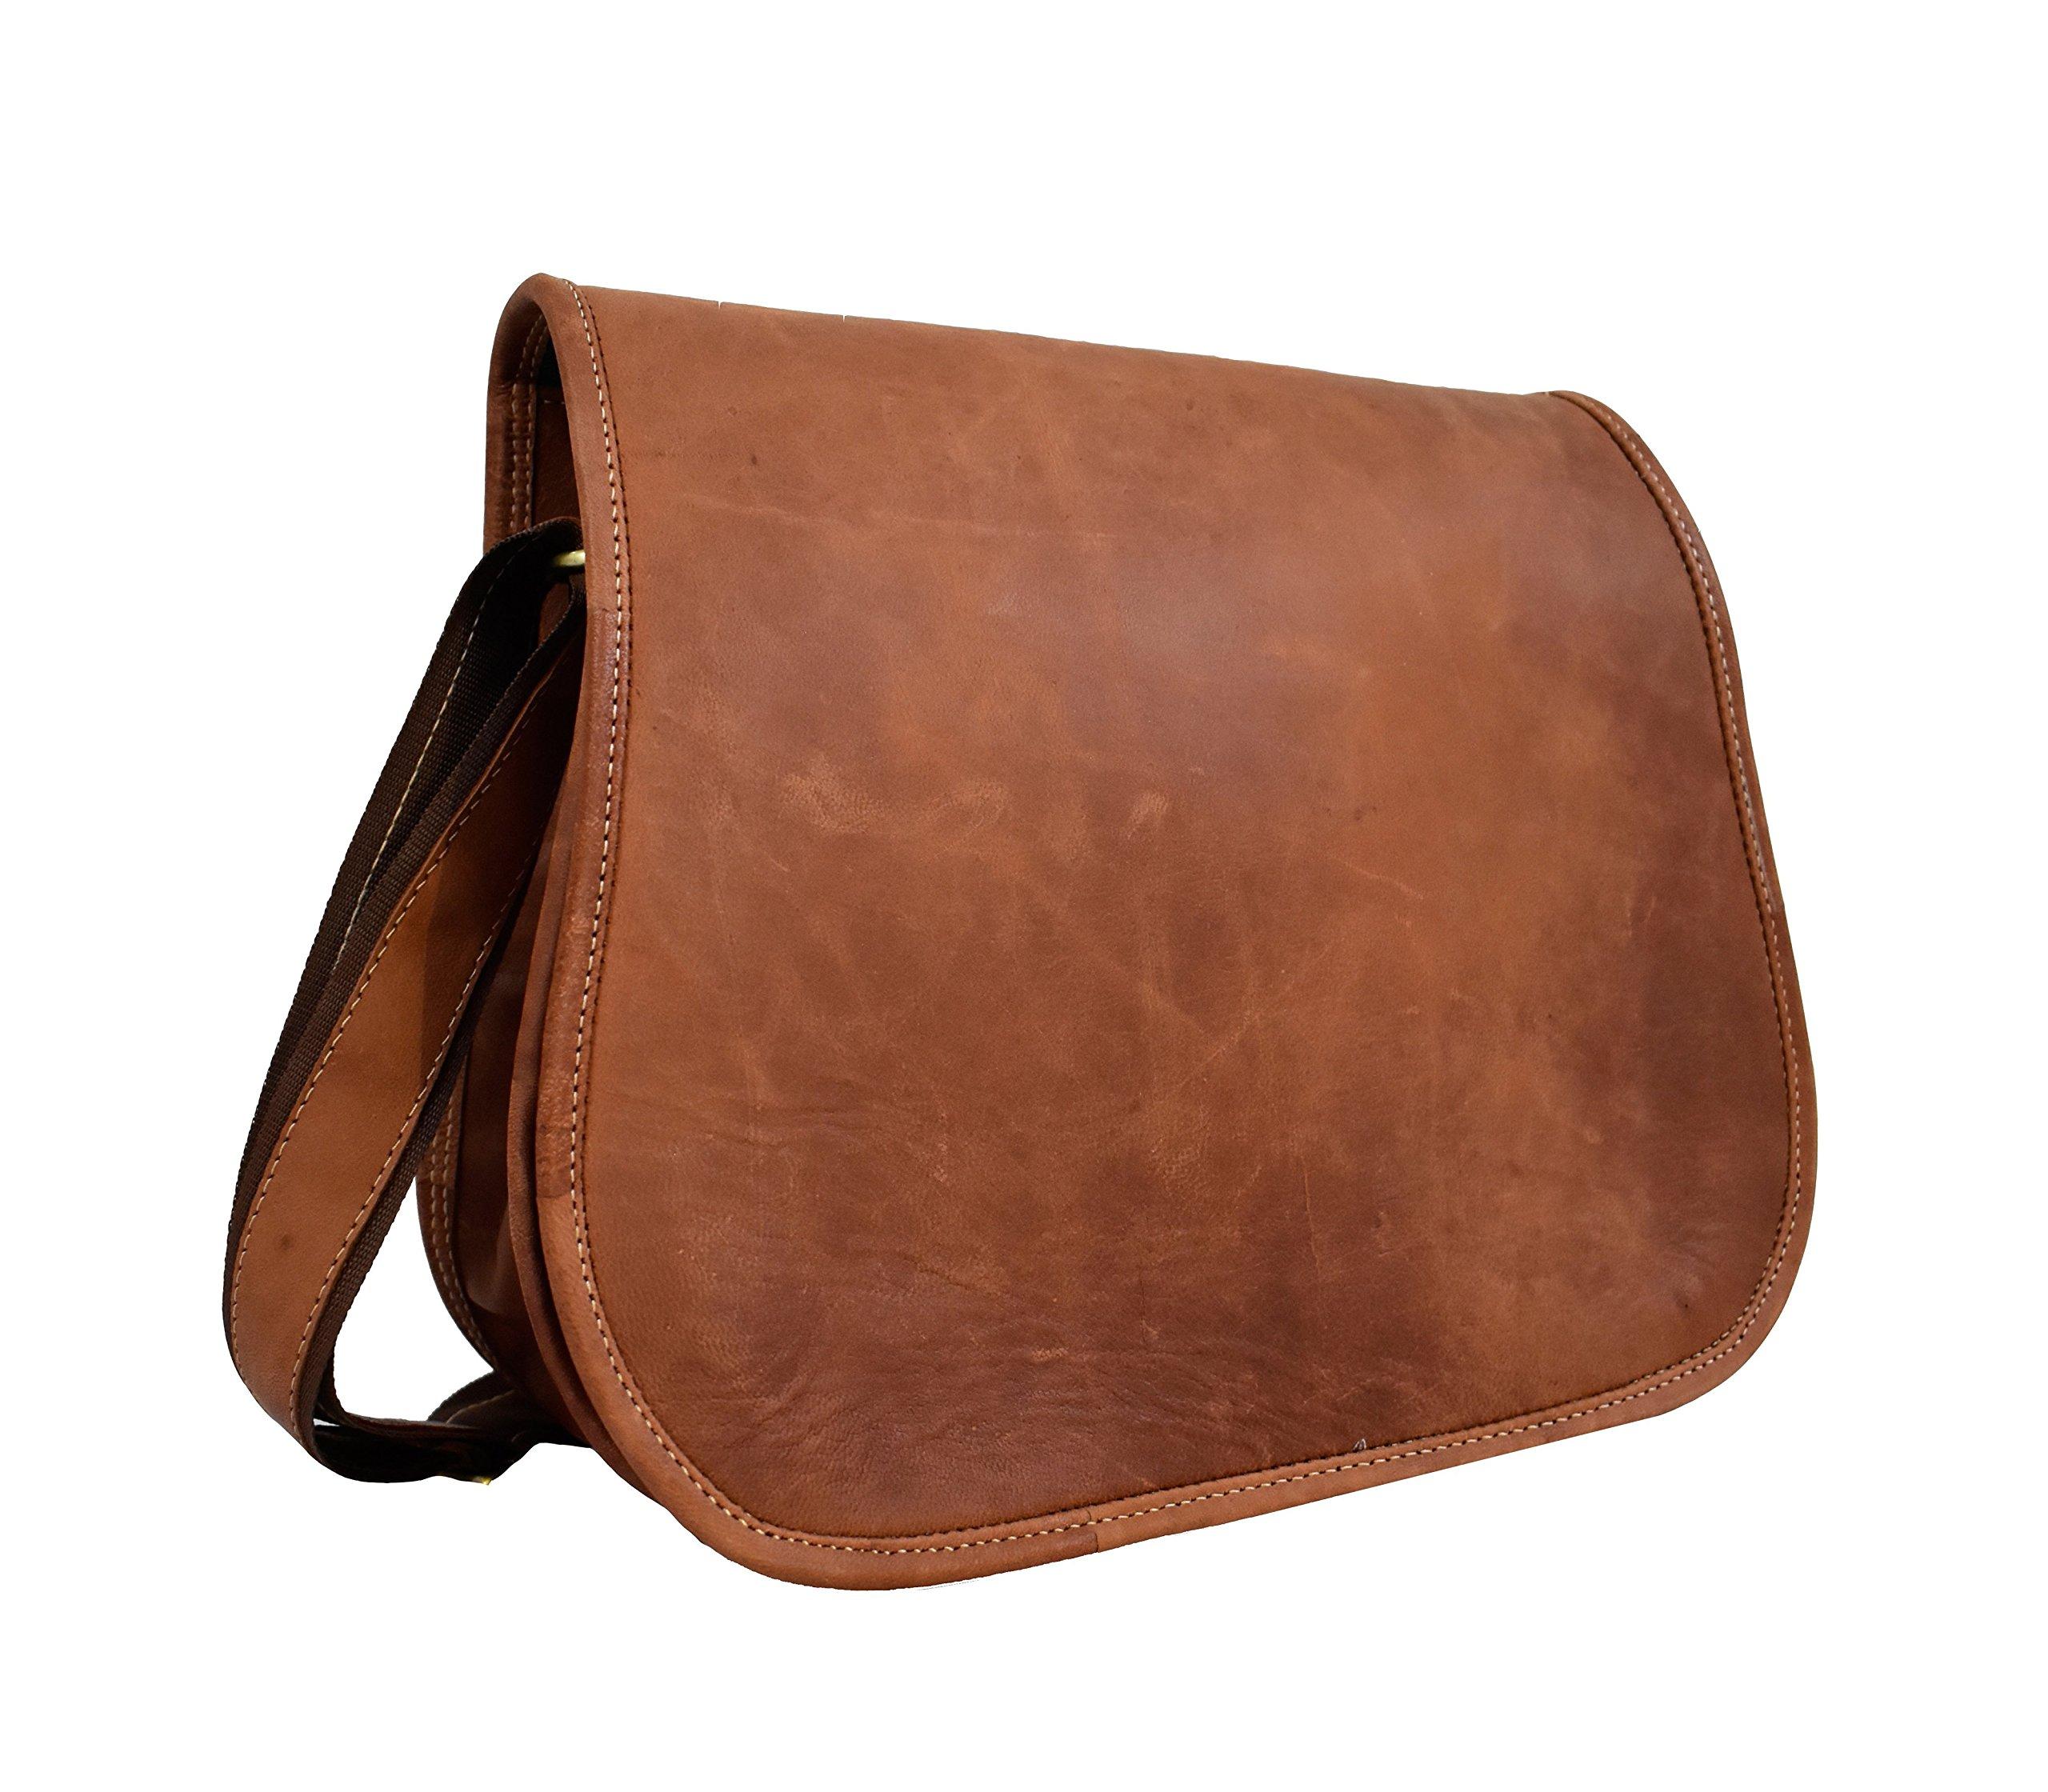 adwaita 14 inch full flap Women's Leather Purse Satchel Handbag Tote Bag